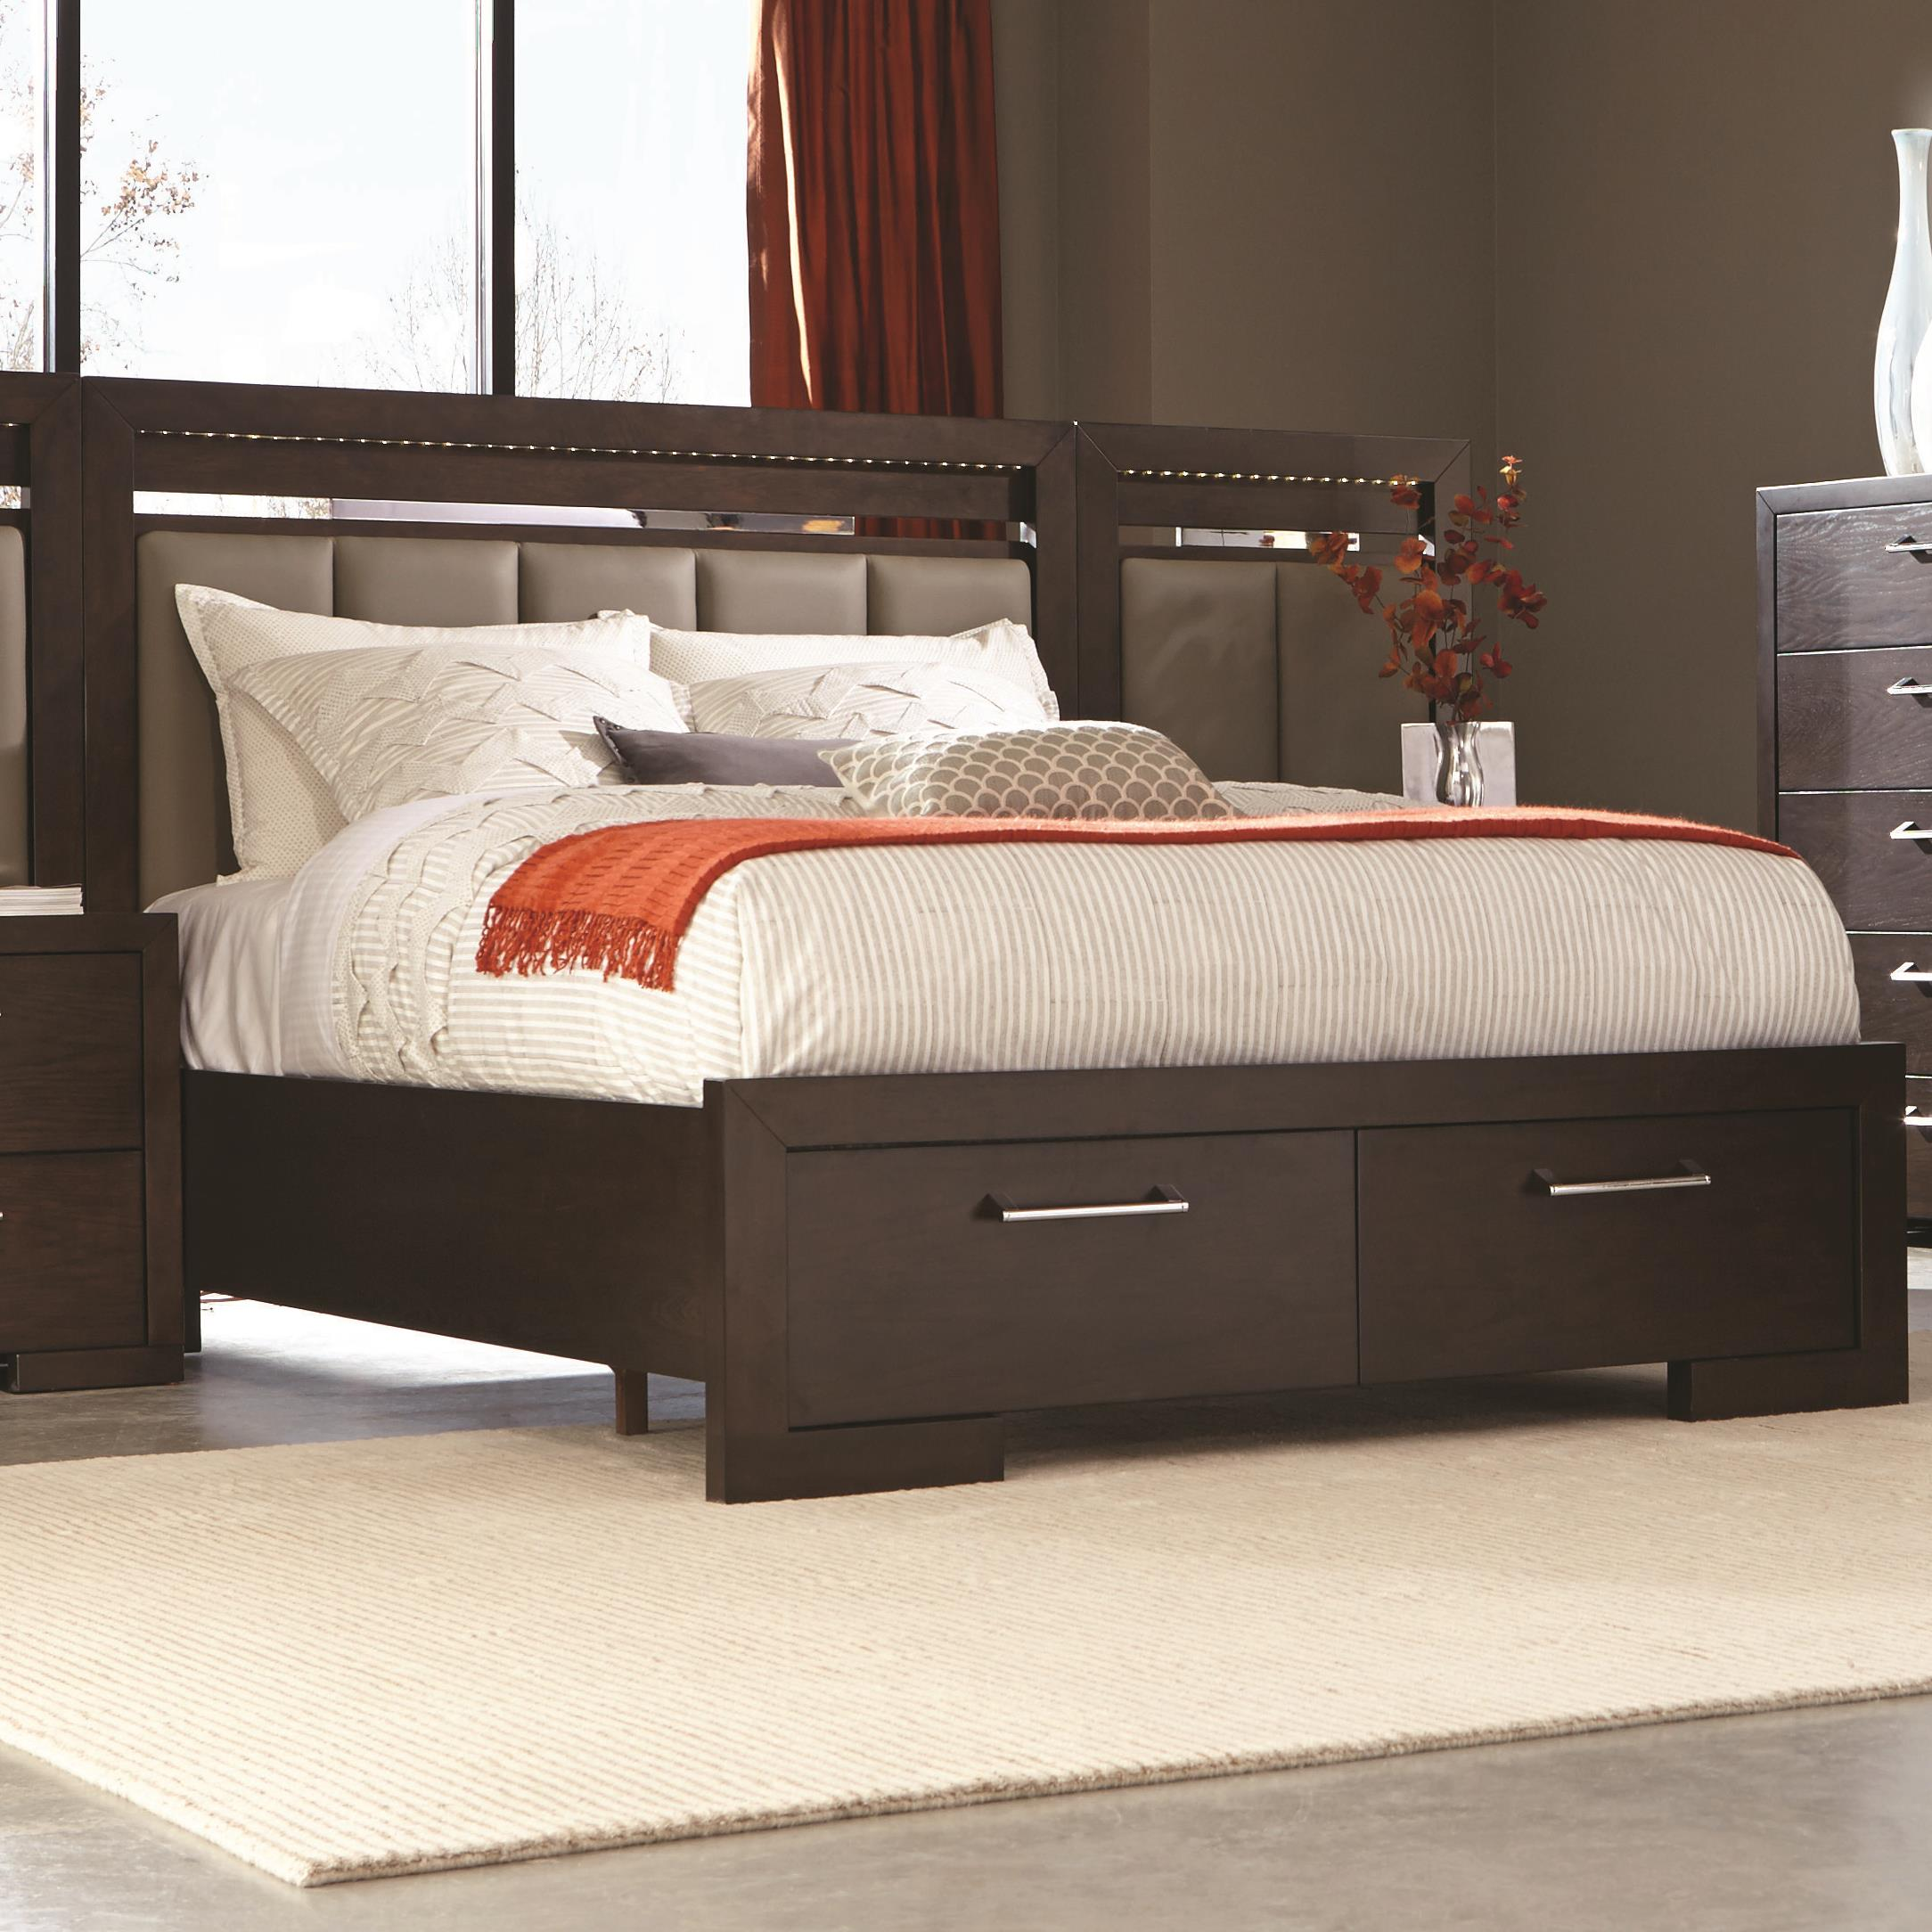 Coaster Berkshire California King Storage Bed - Item Number: 204460KW